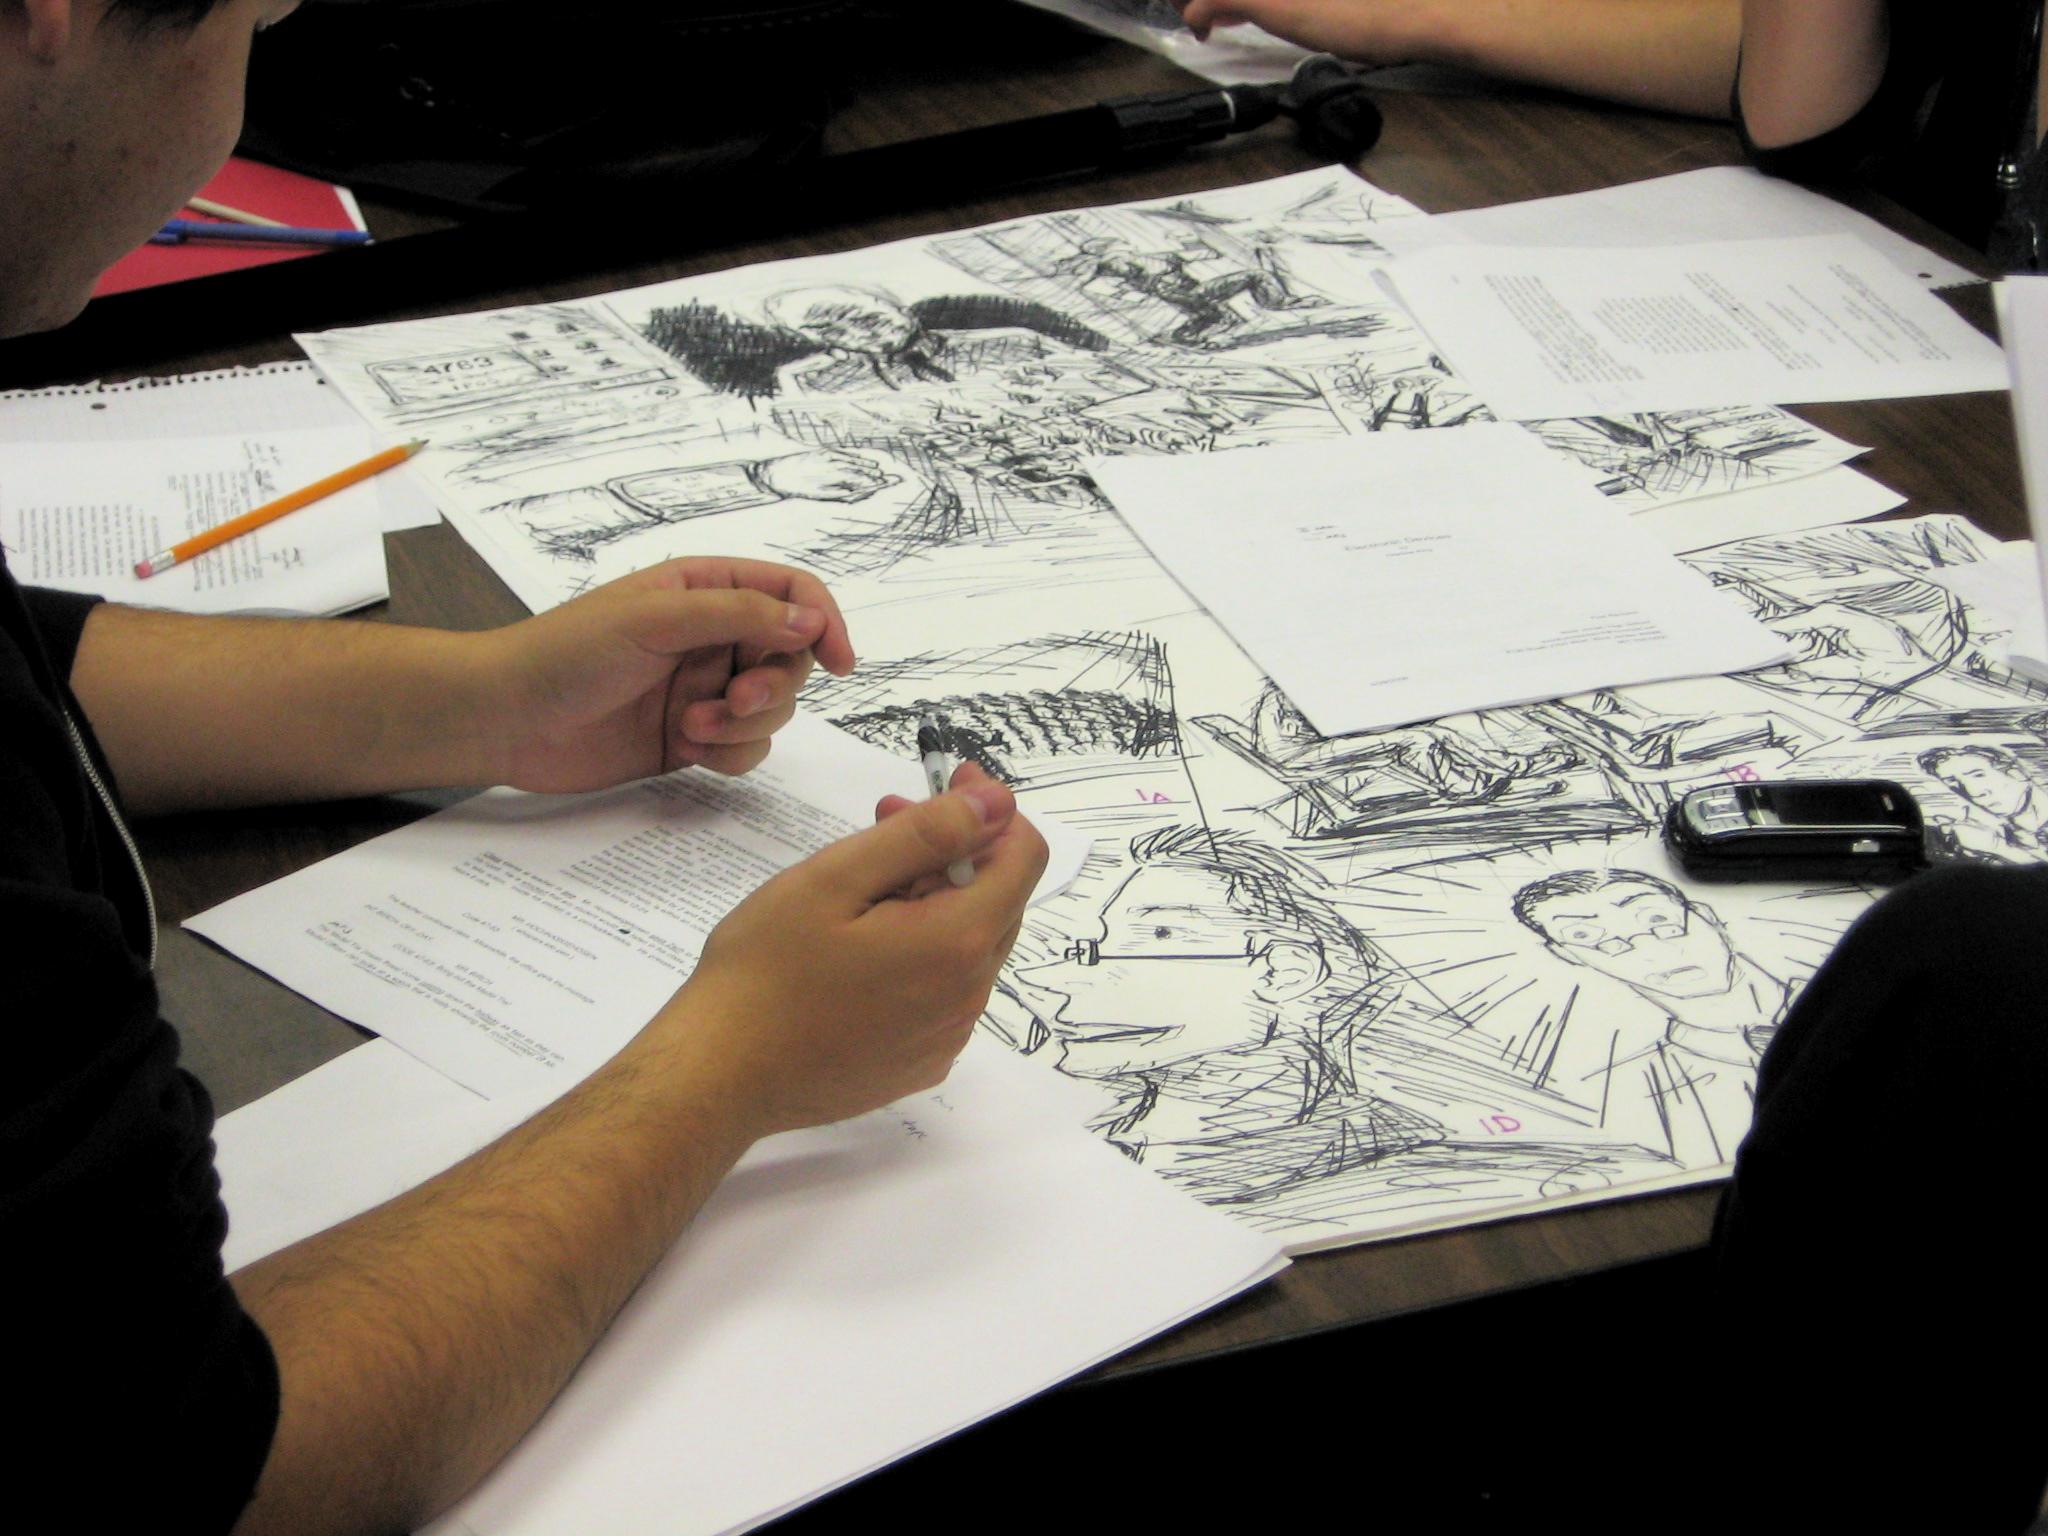 Dibujante Dibujante Libre Dibujante WikipediaLa Enciclopedia WikipediaLa Enciclopedia Libre OikXuZP